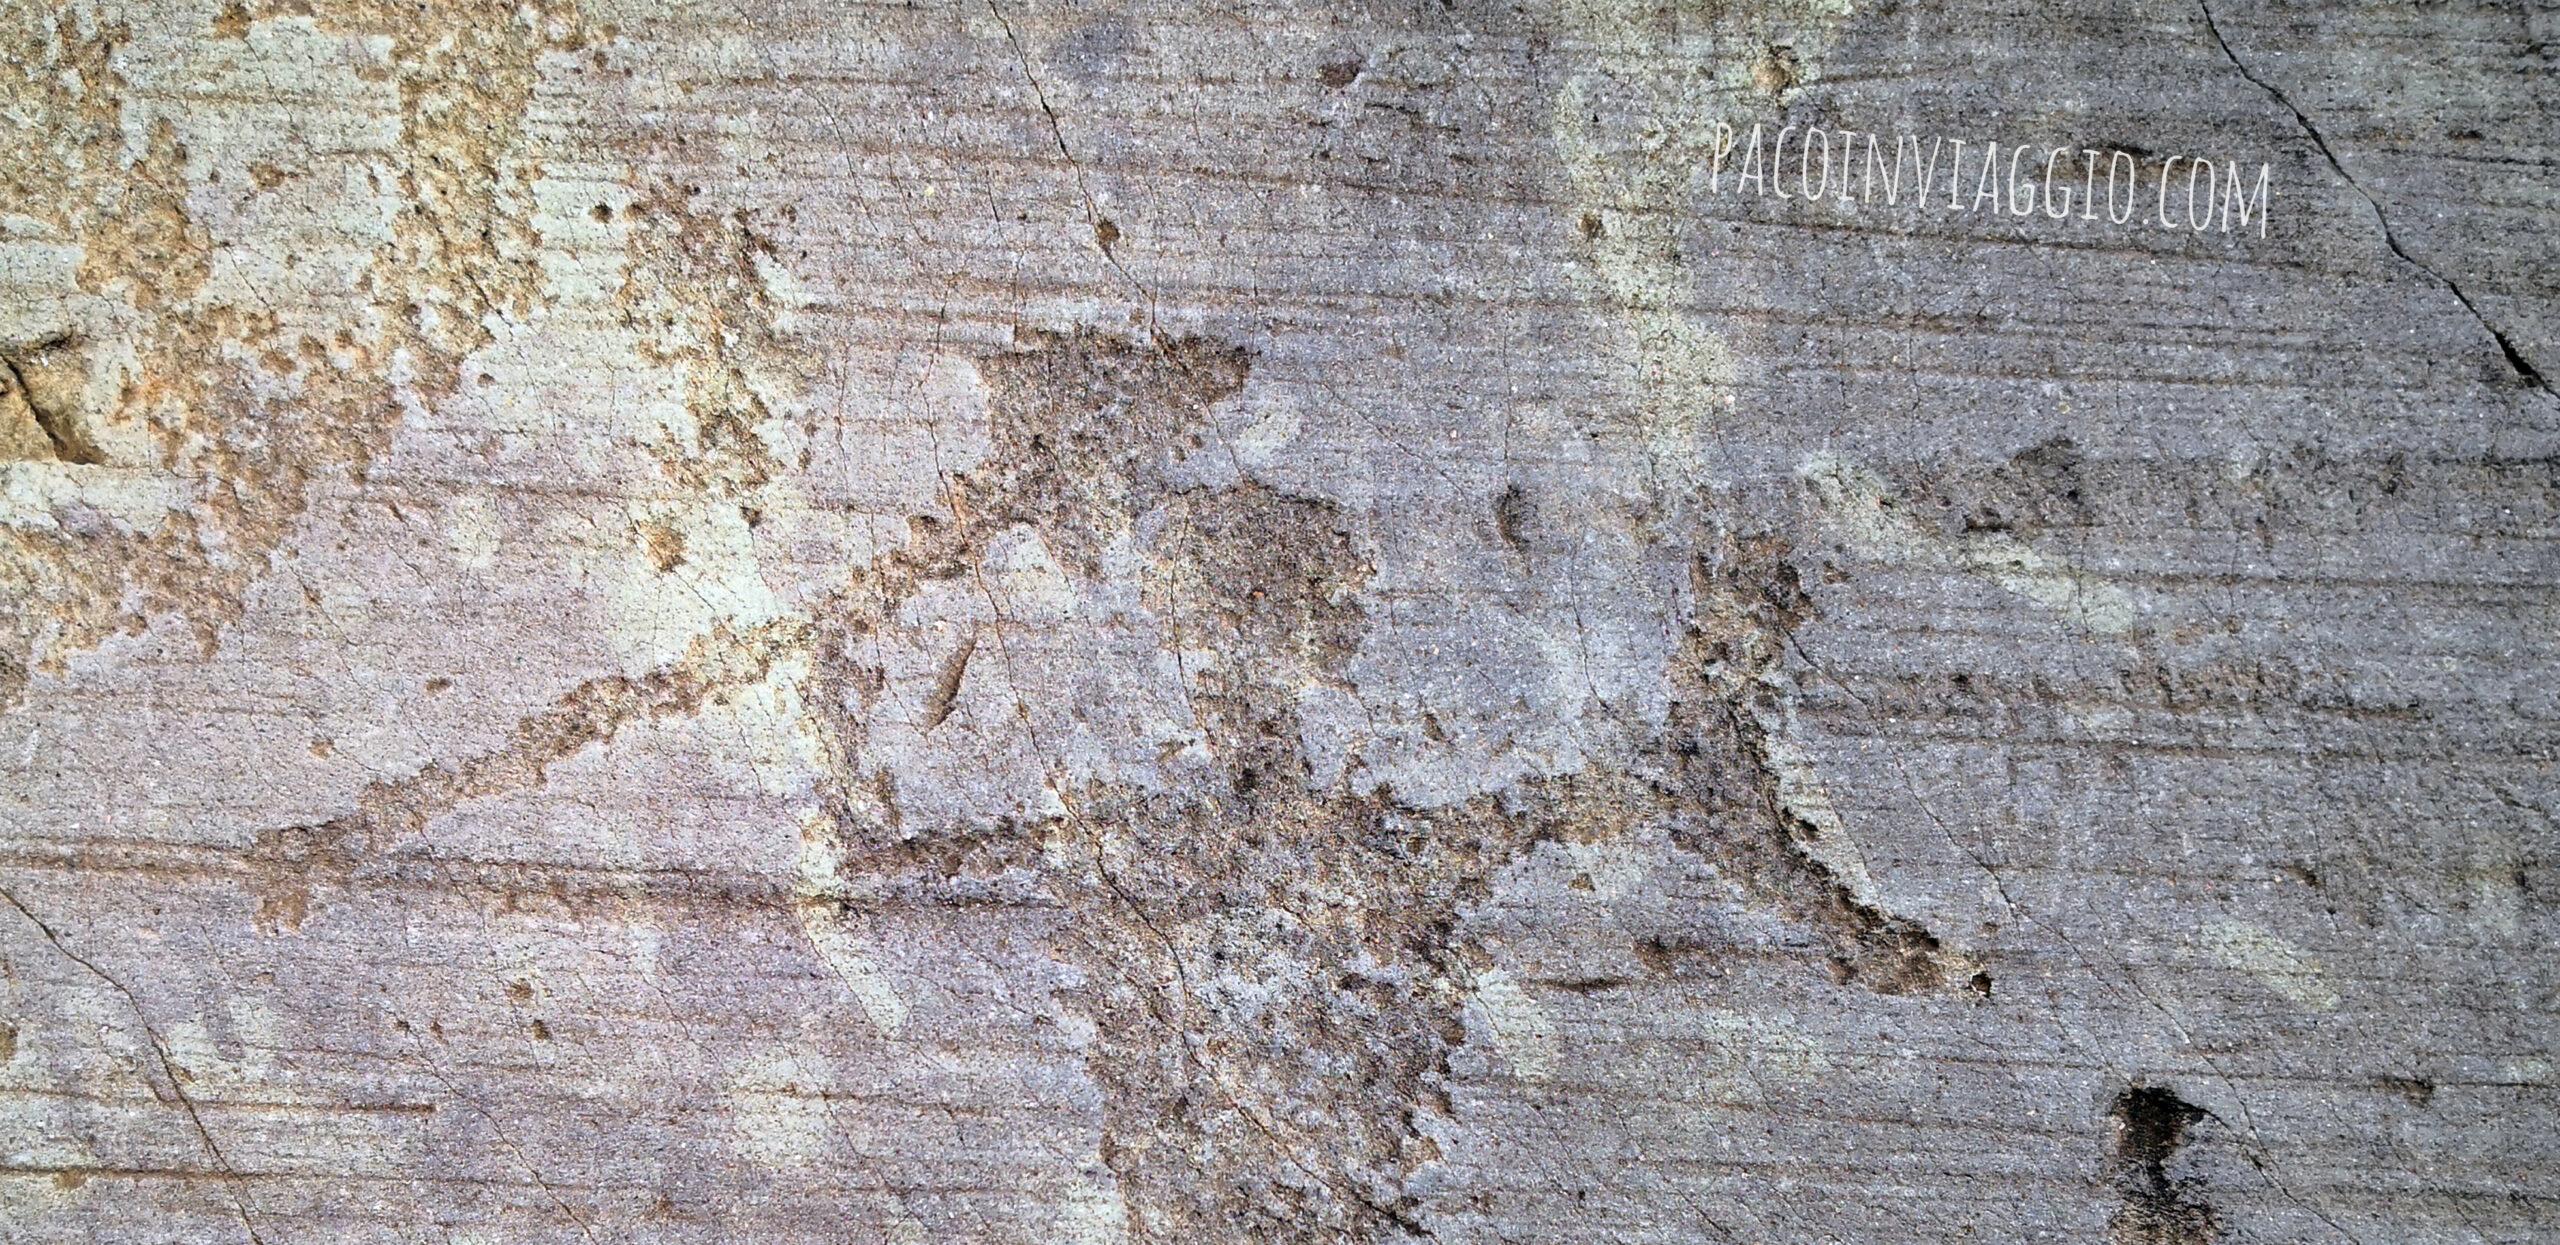 Le incisioni rupestri e le stelle cancellate